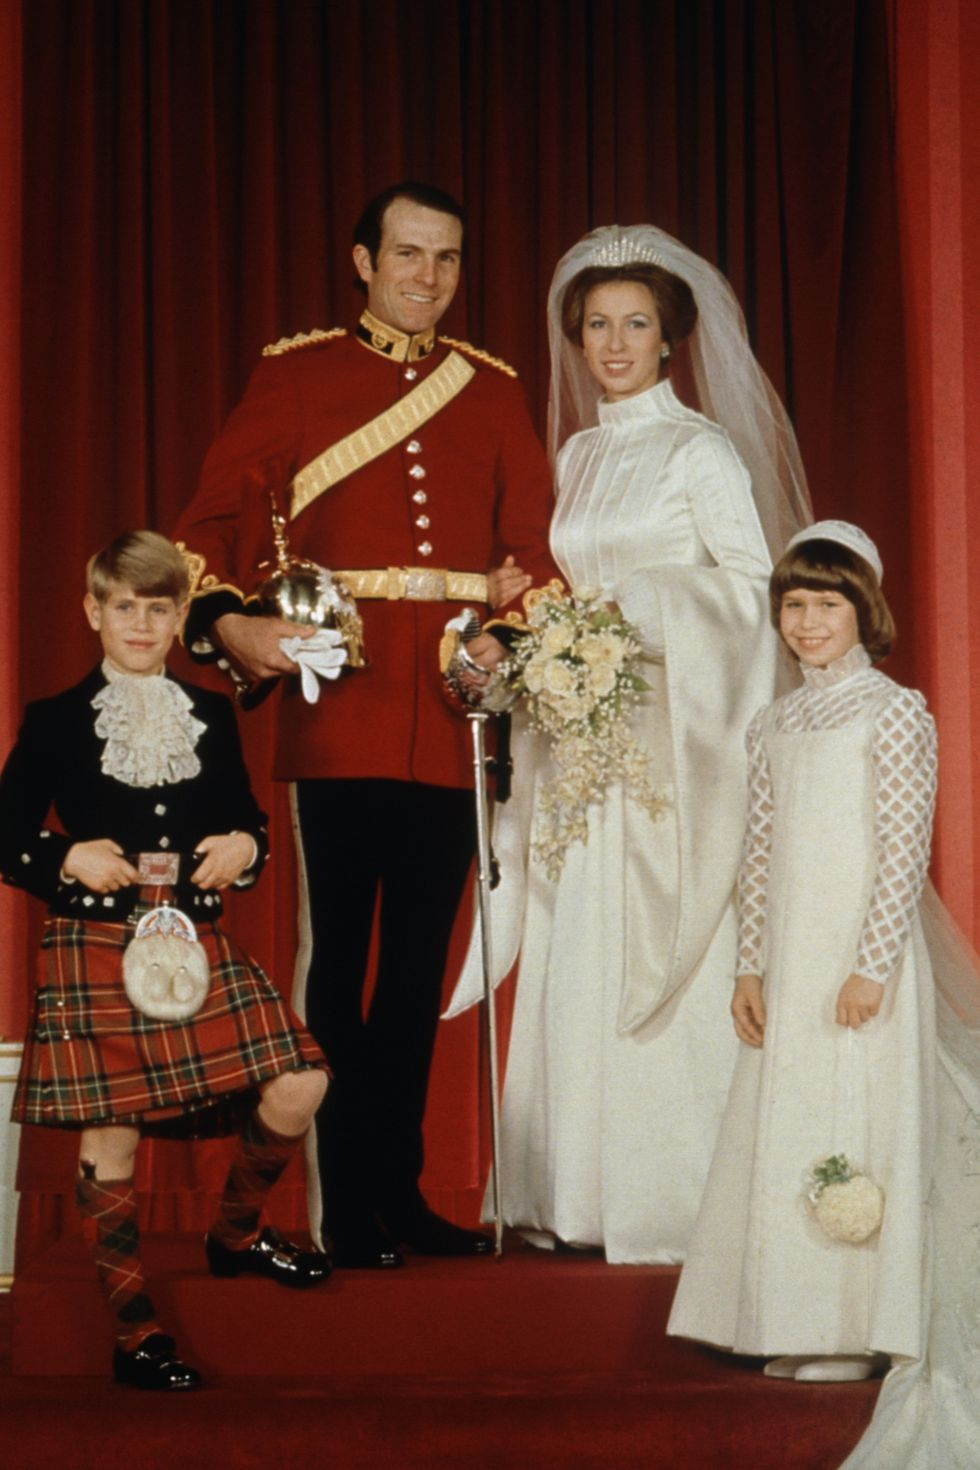 Princess Anne & Mark Phillips